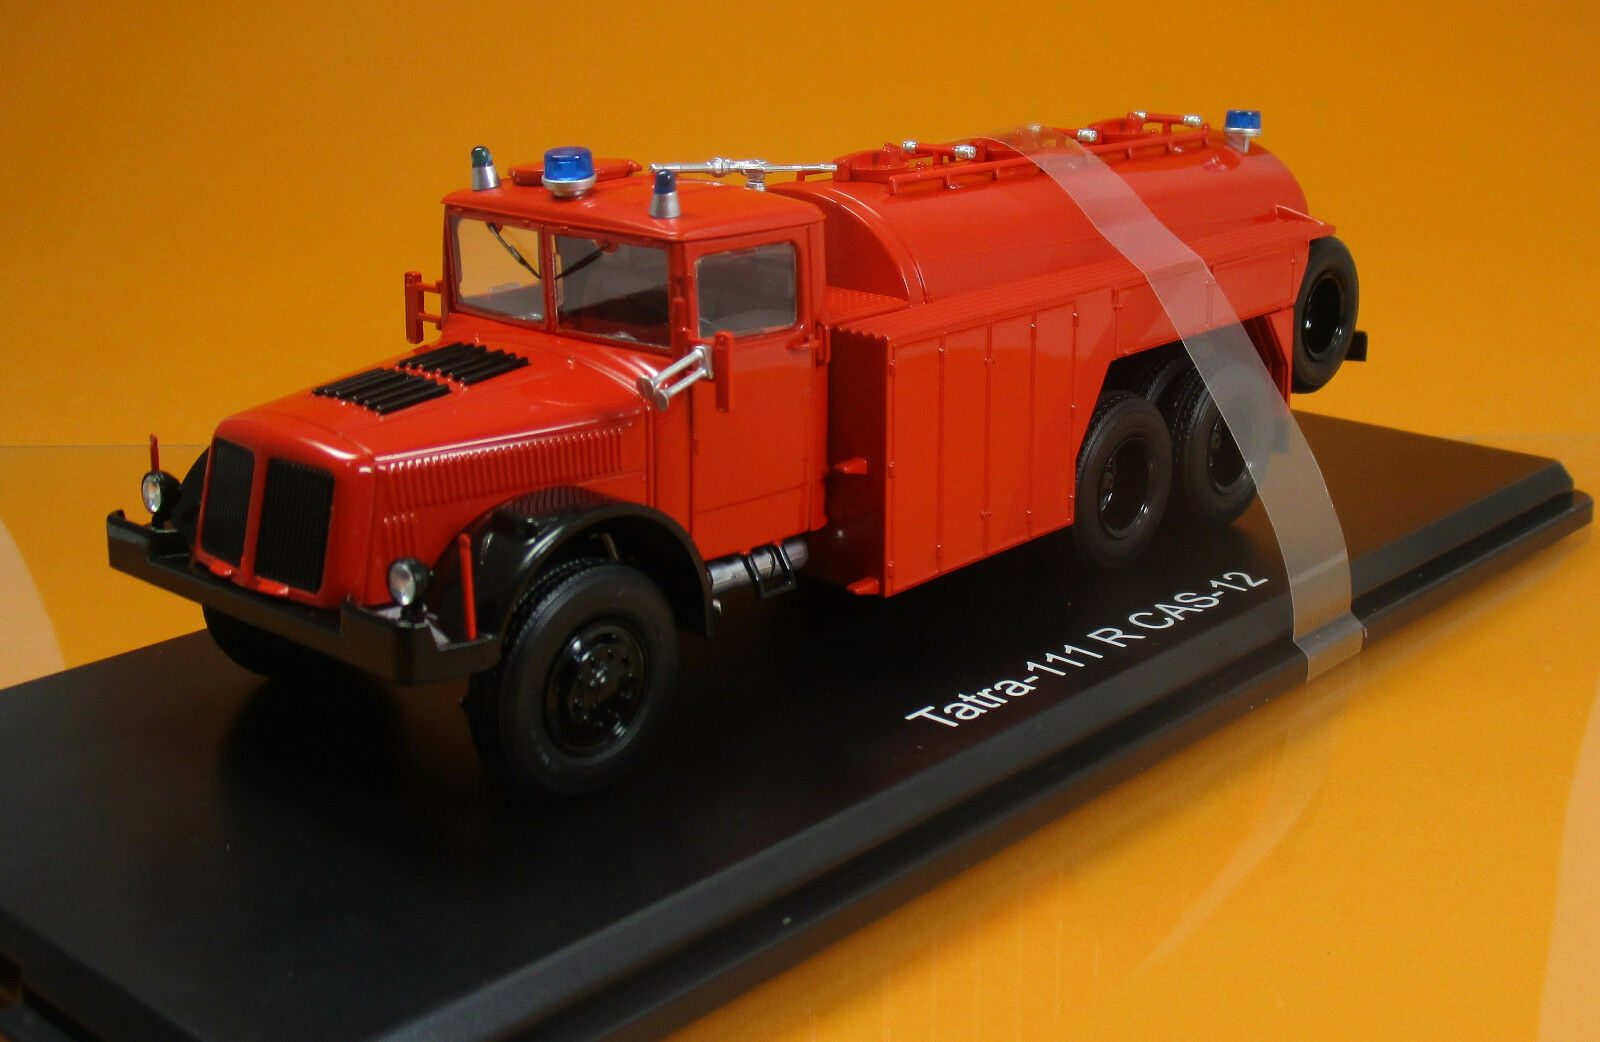 Herpa 83ssm1309 TATRA 111 C Tanklösahrzeug pompiers scale 1 43 NOUVEAU neuf dans sa boîte